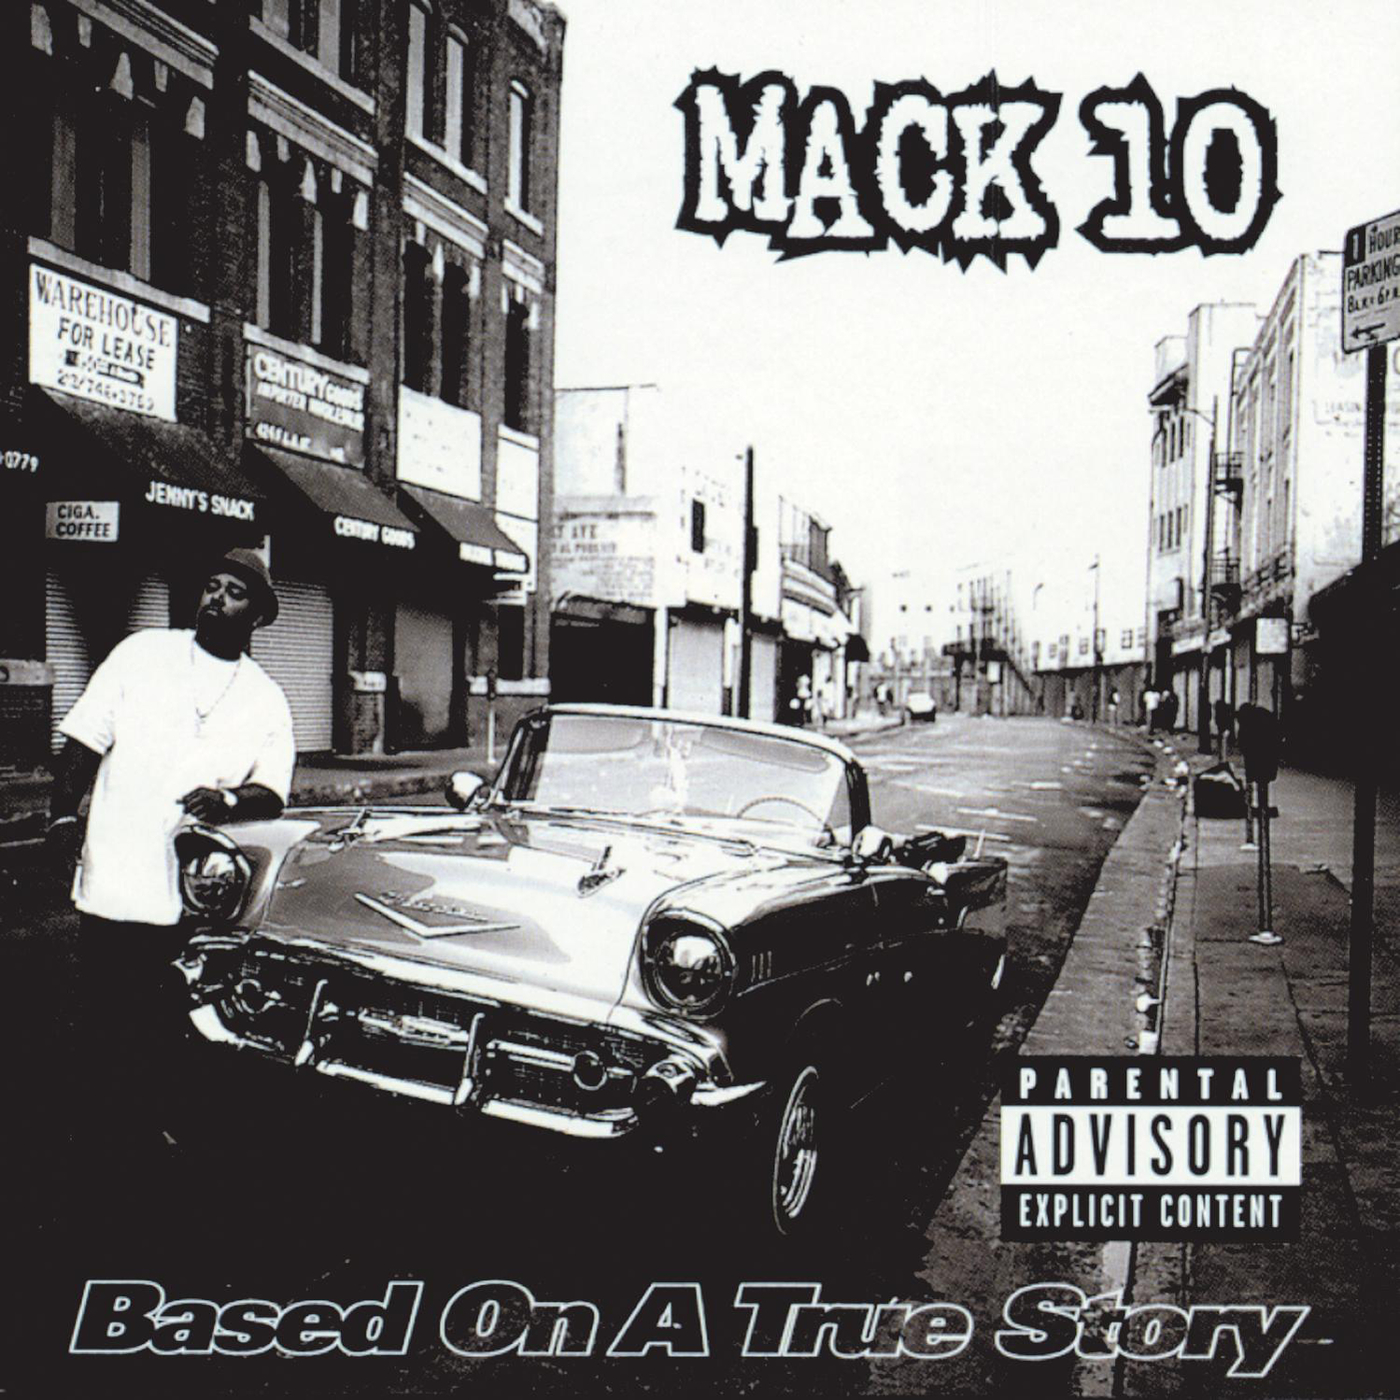 Listen Free to Mack 10 - Backyard Boogie Radio | iHeartRadio